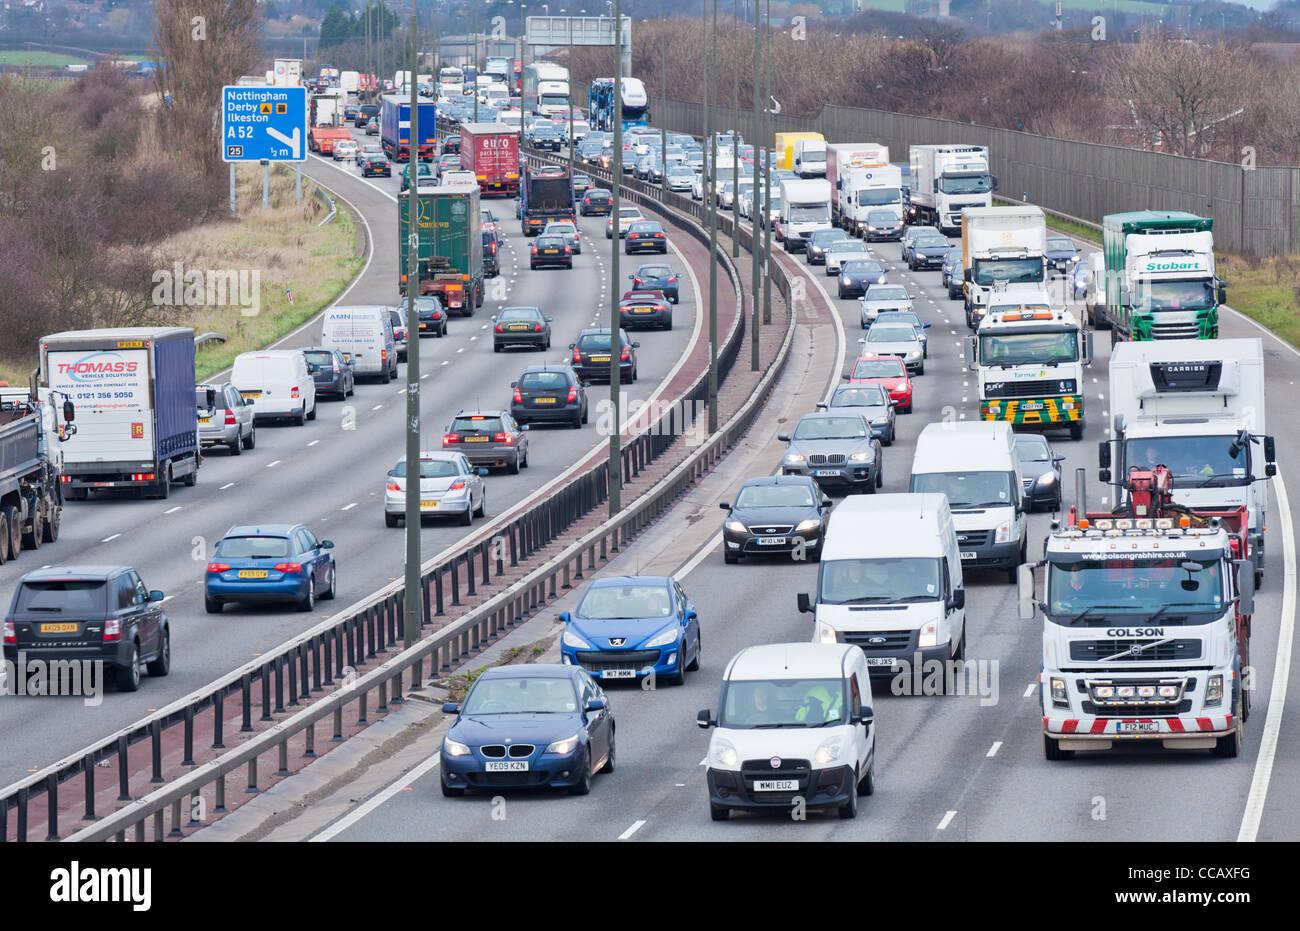 Autostrada ingorgo sull'autostrada M1 nei pressi di svincolo 25 Nottingham Inghilterra gb uk eu europe Immagini Stock